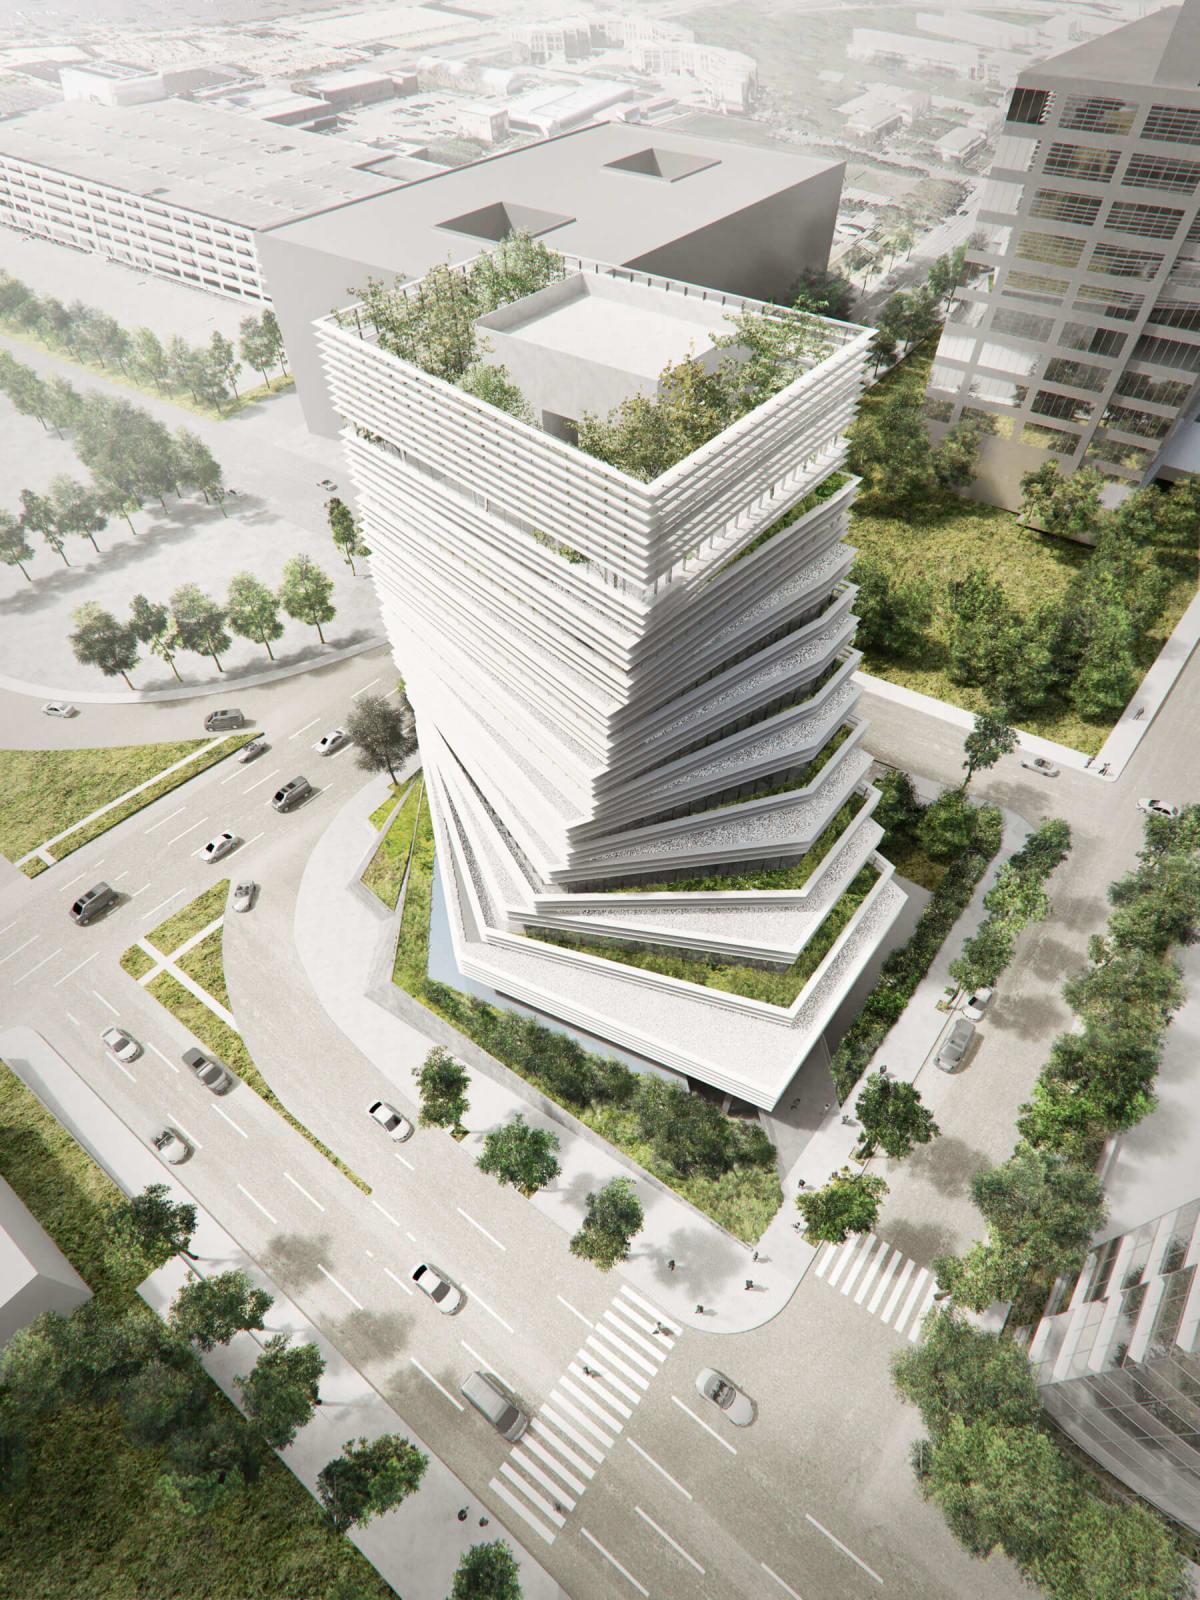 New Rolex building